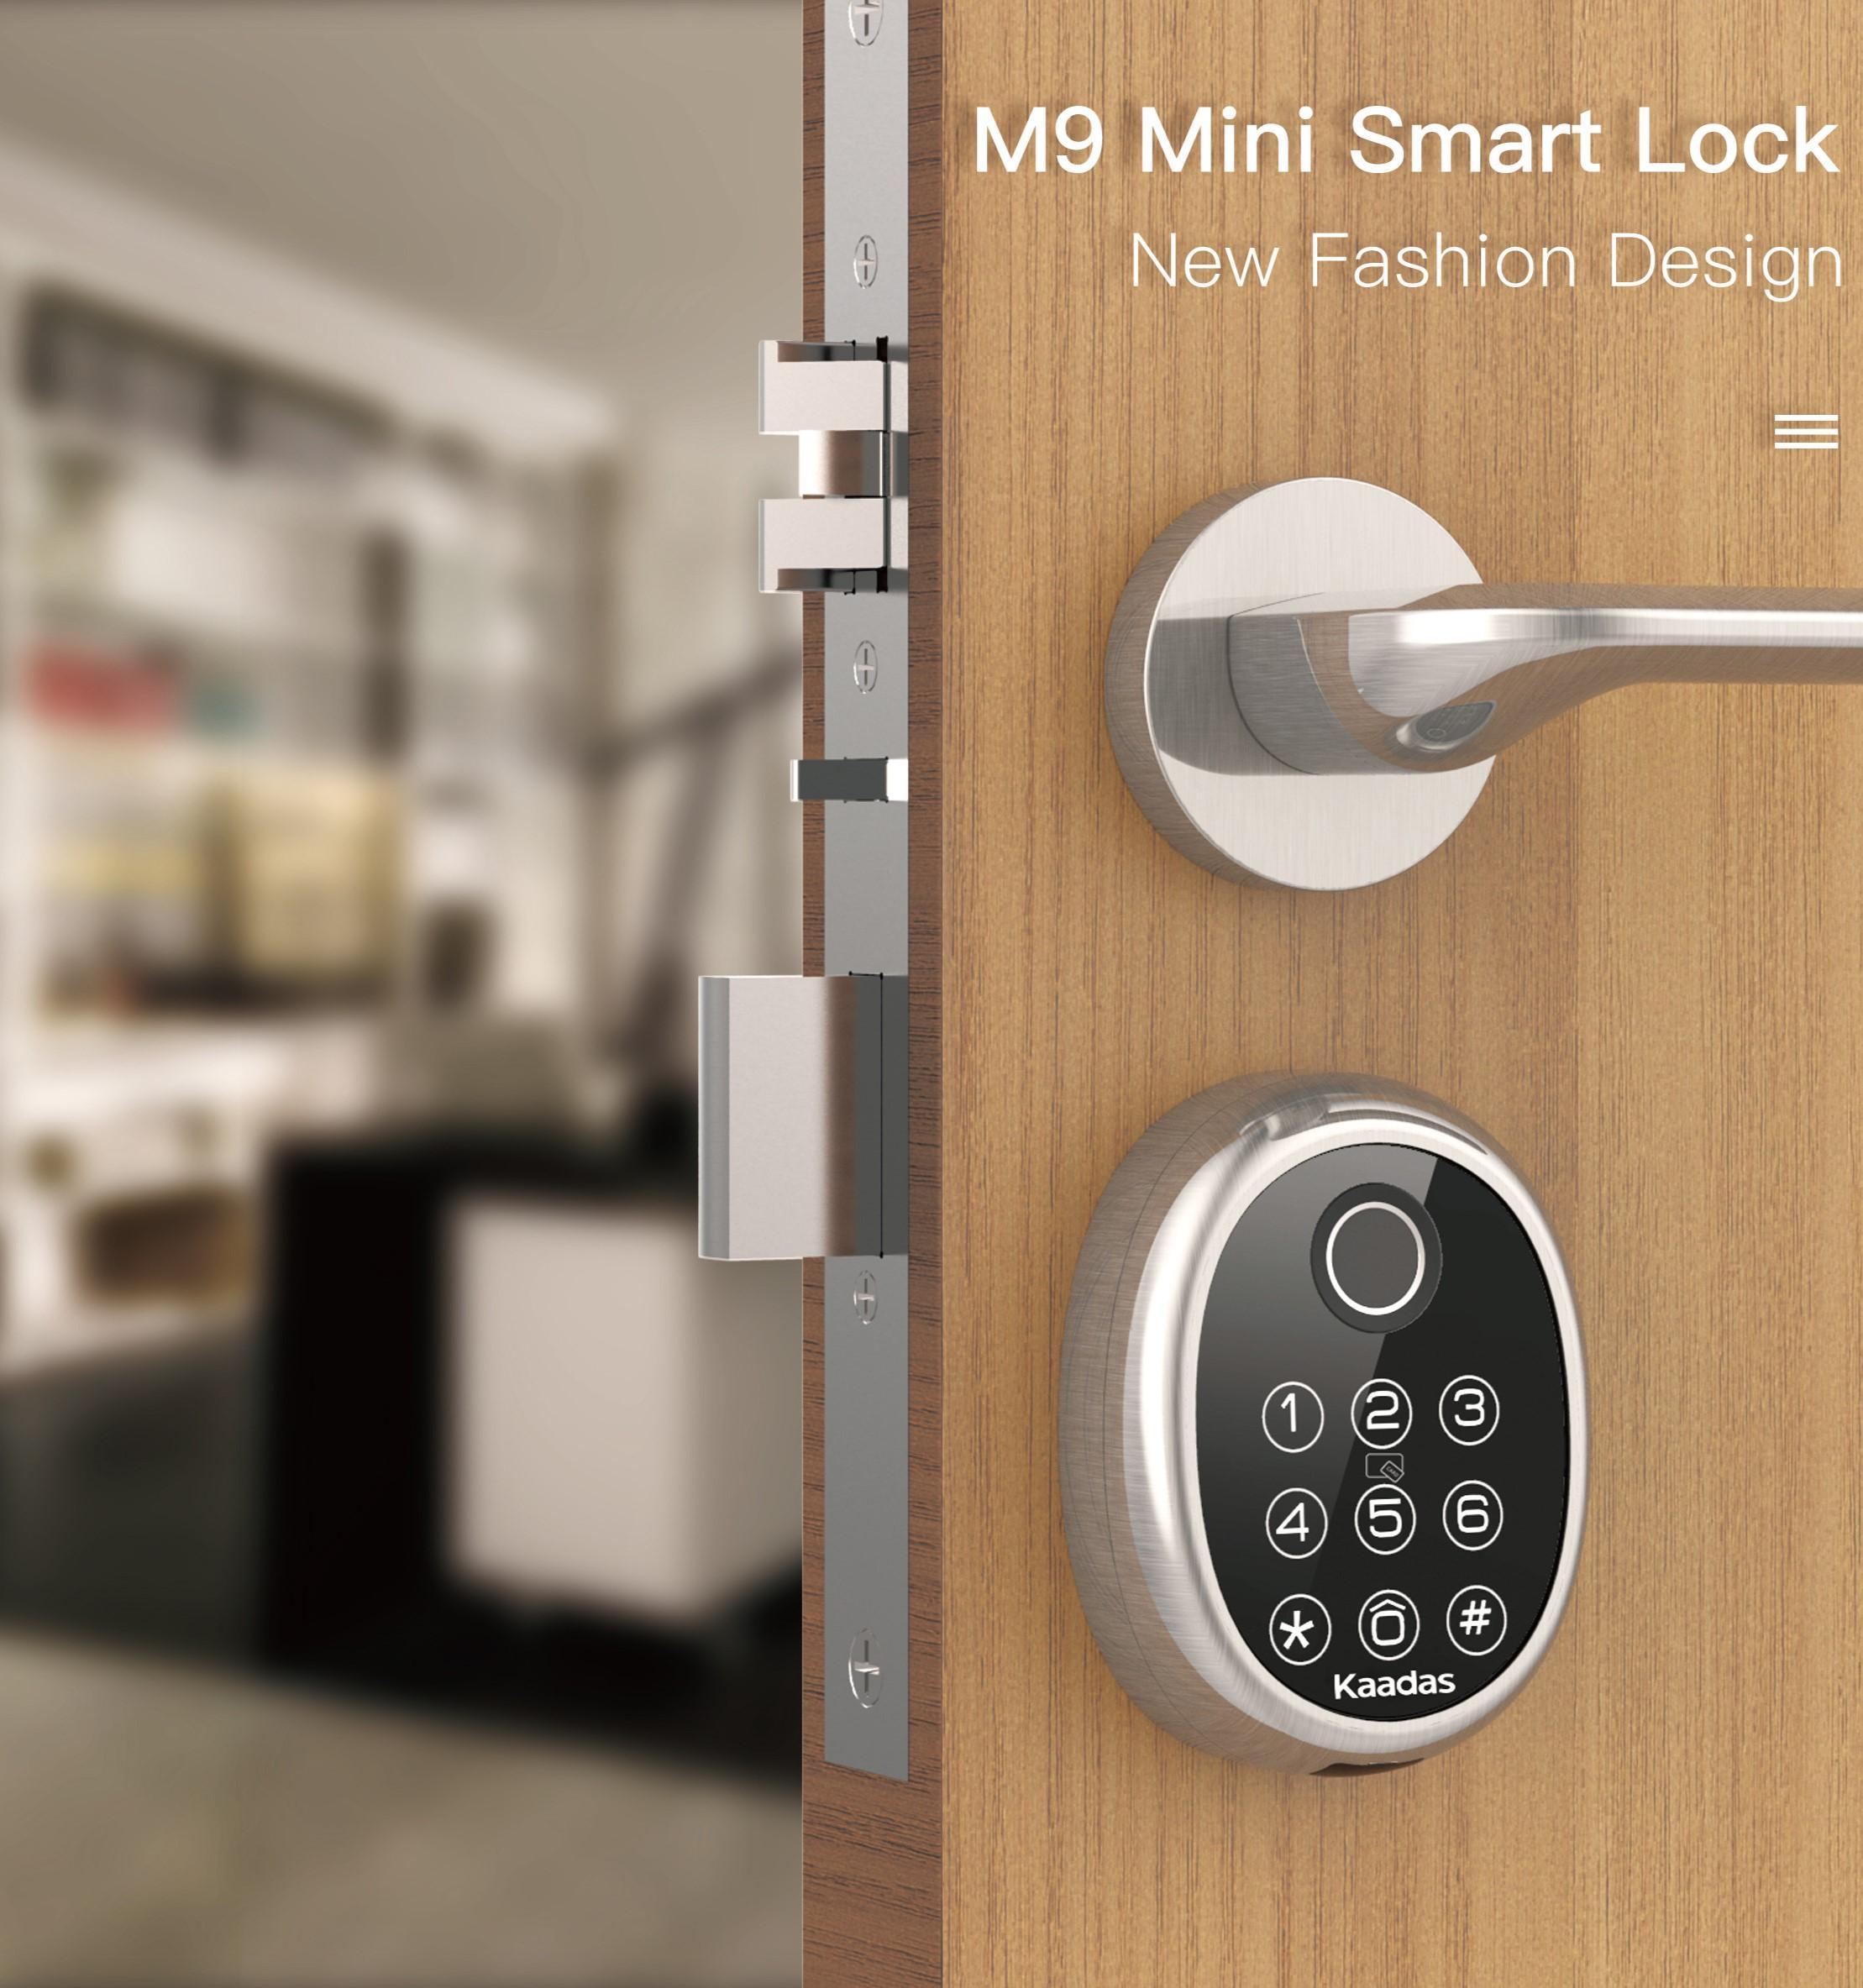 Kaadas M9 Digital Lock (Sole Distributor in Singapore)